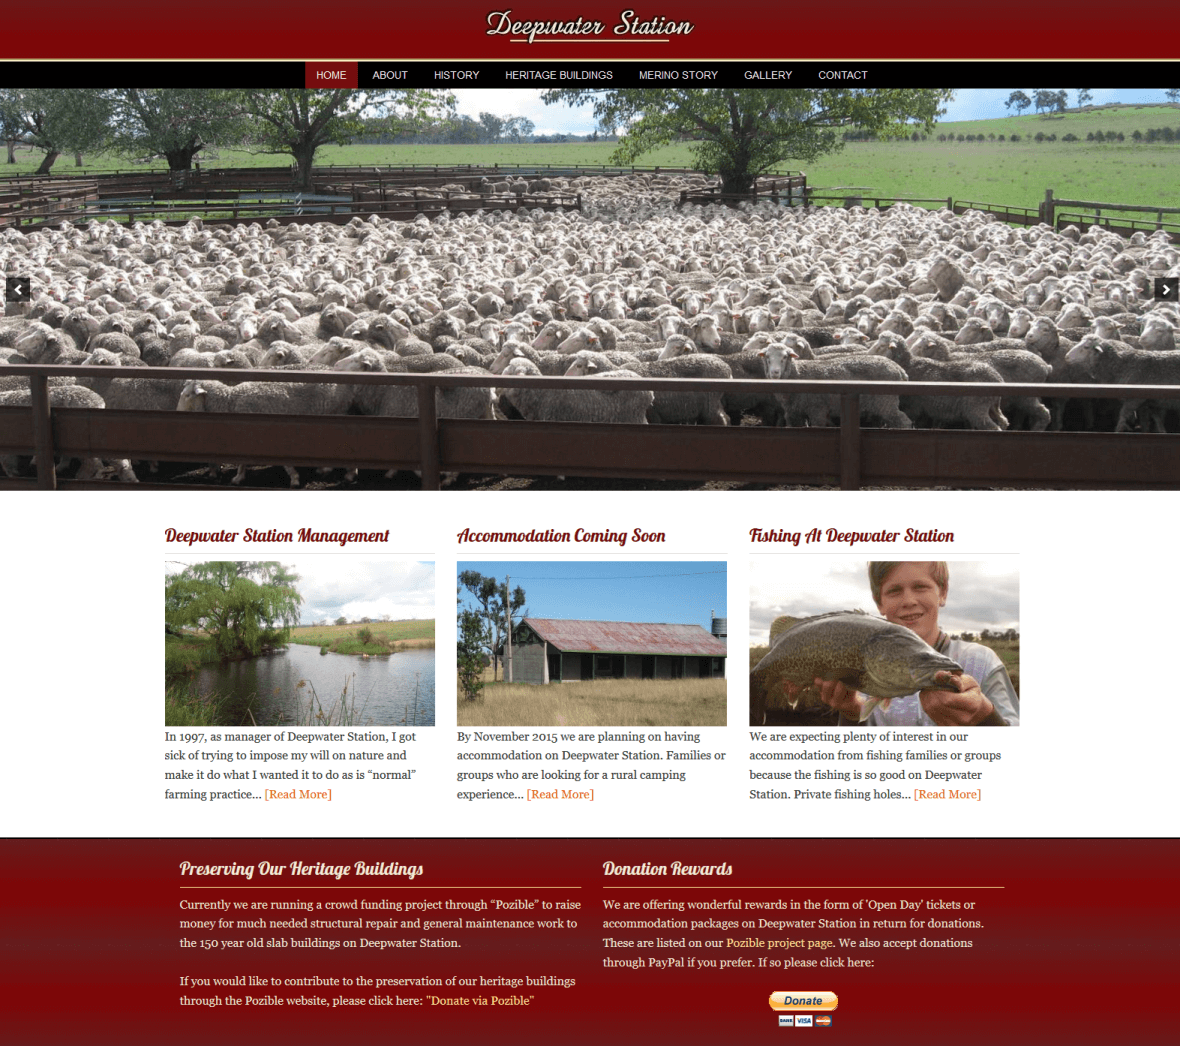 Heritage Listing Website